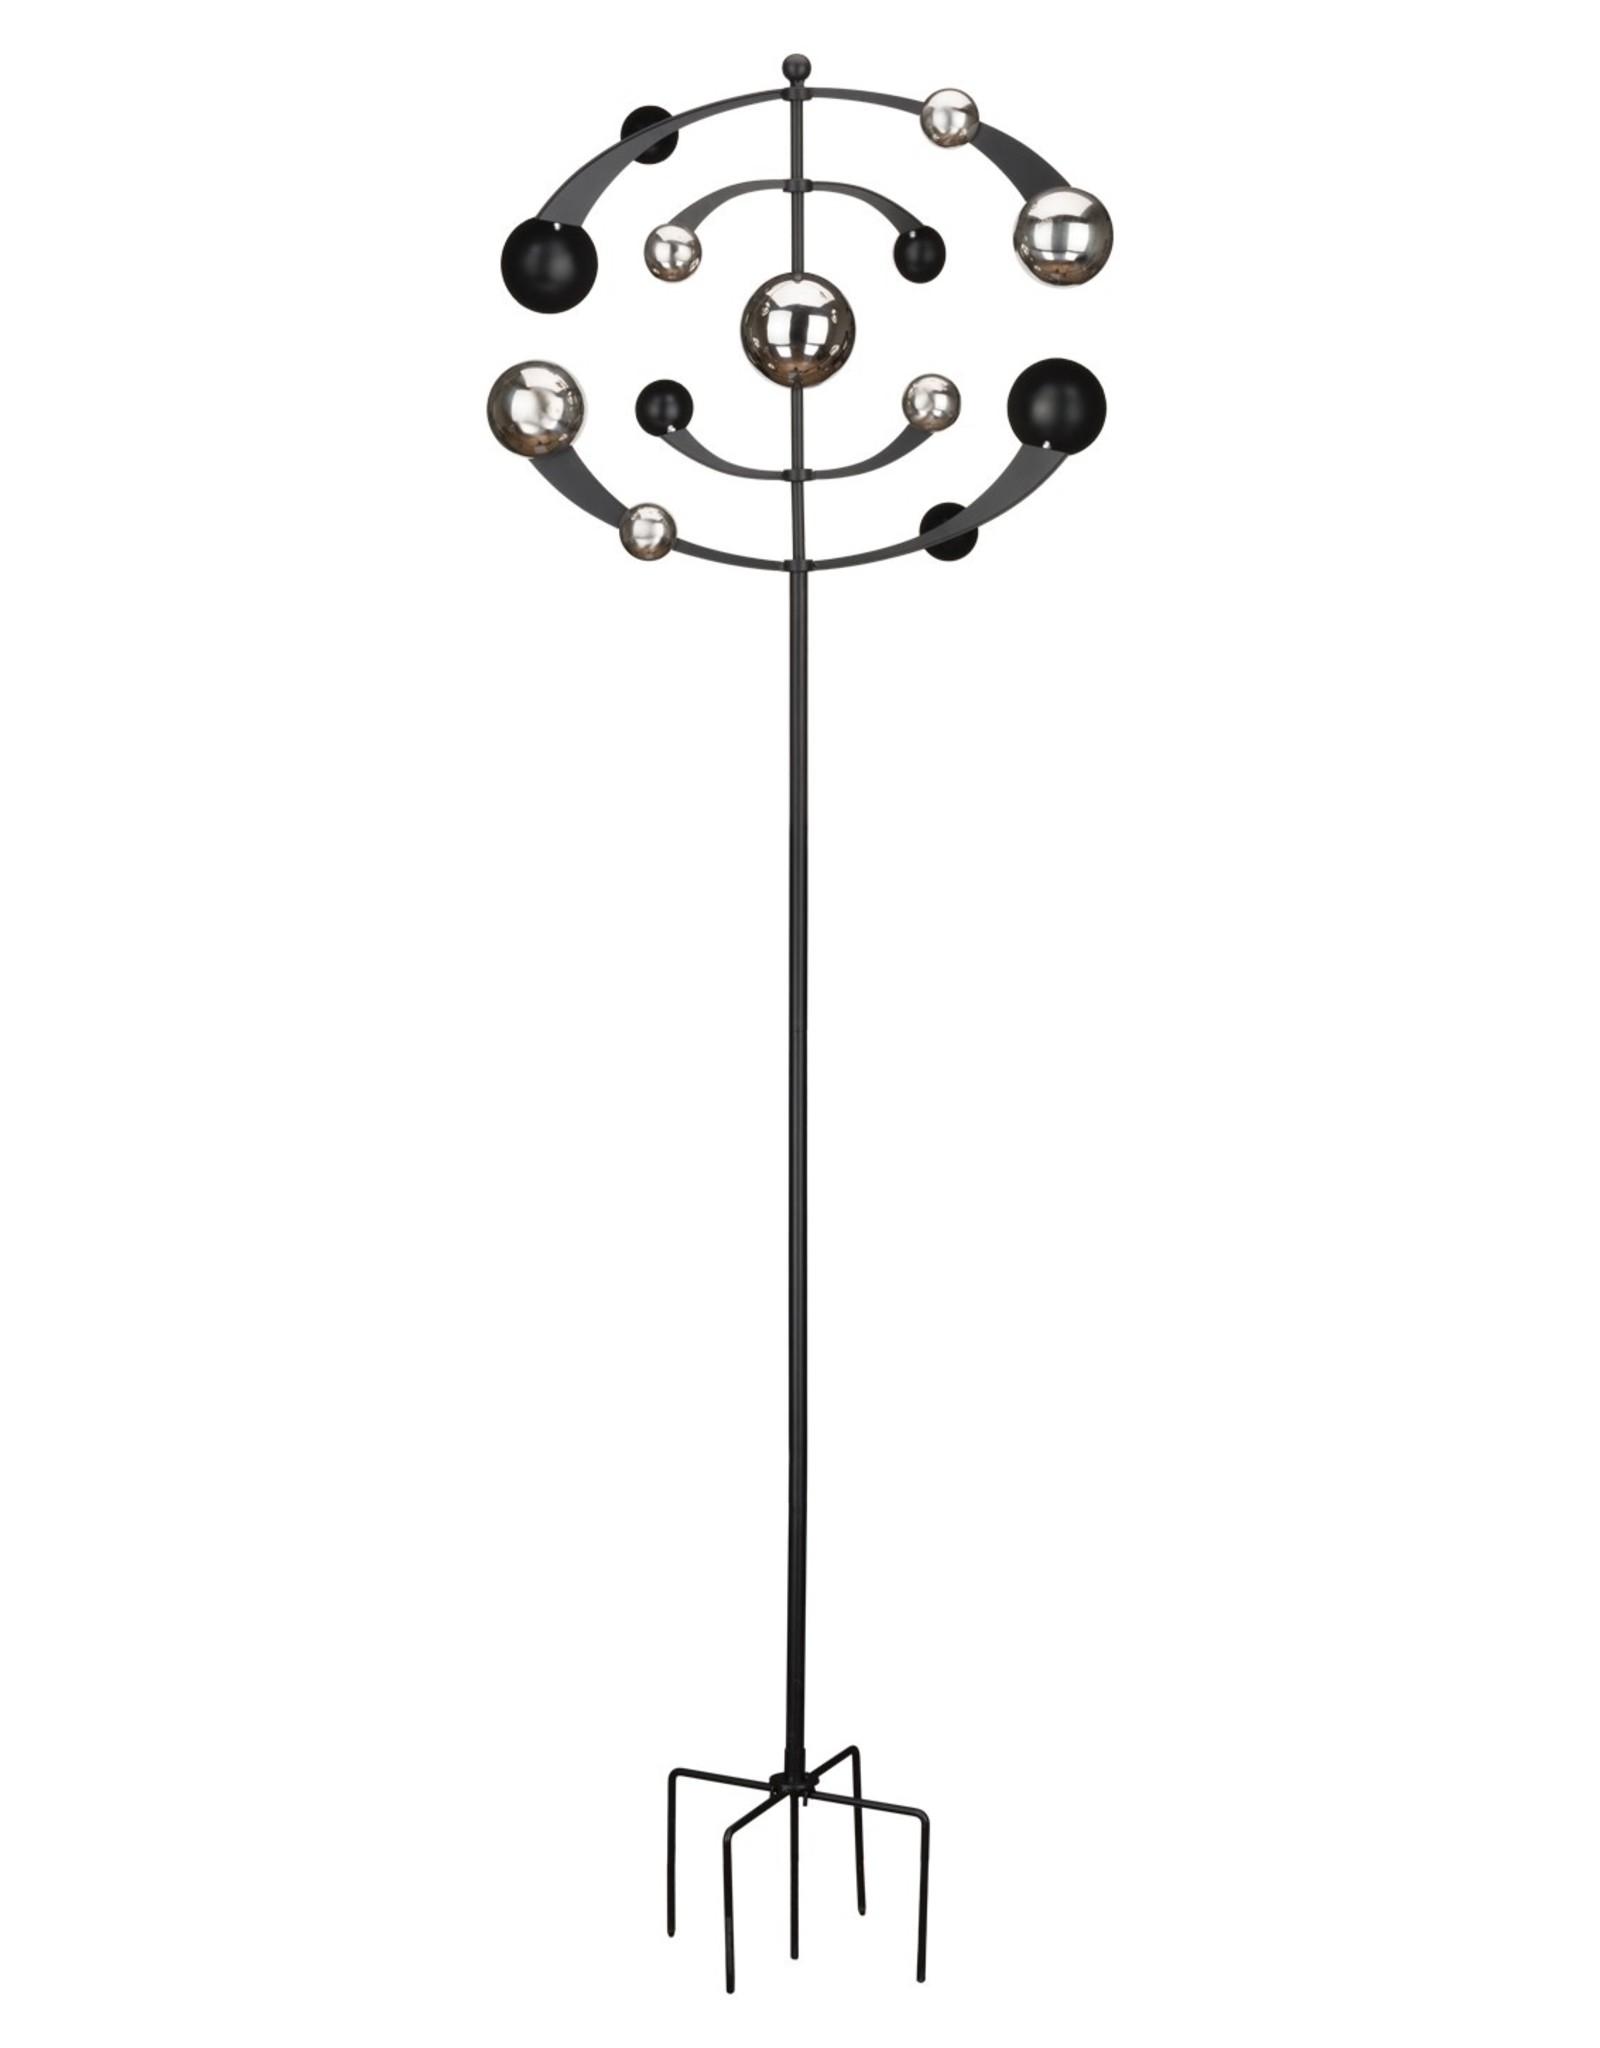 Black & Silver Orbit Spinner Stake